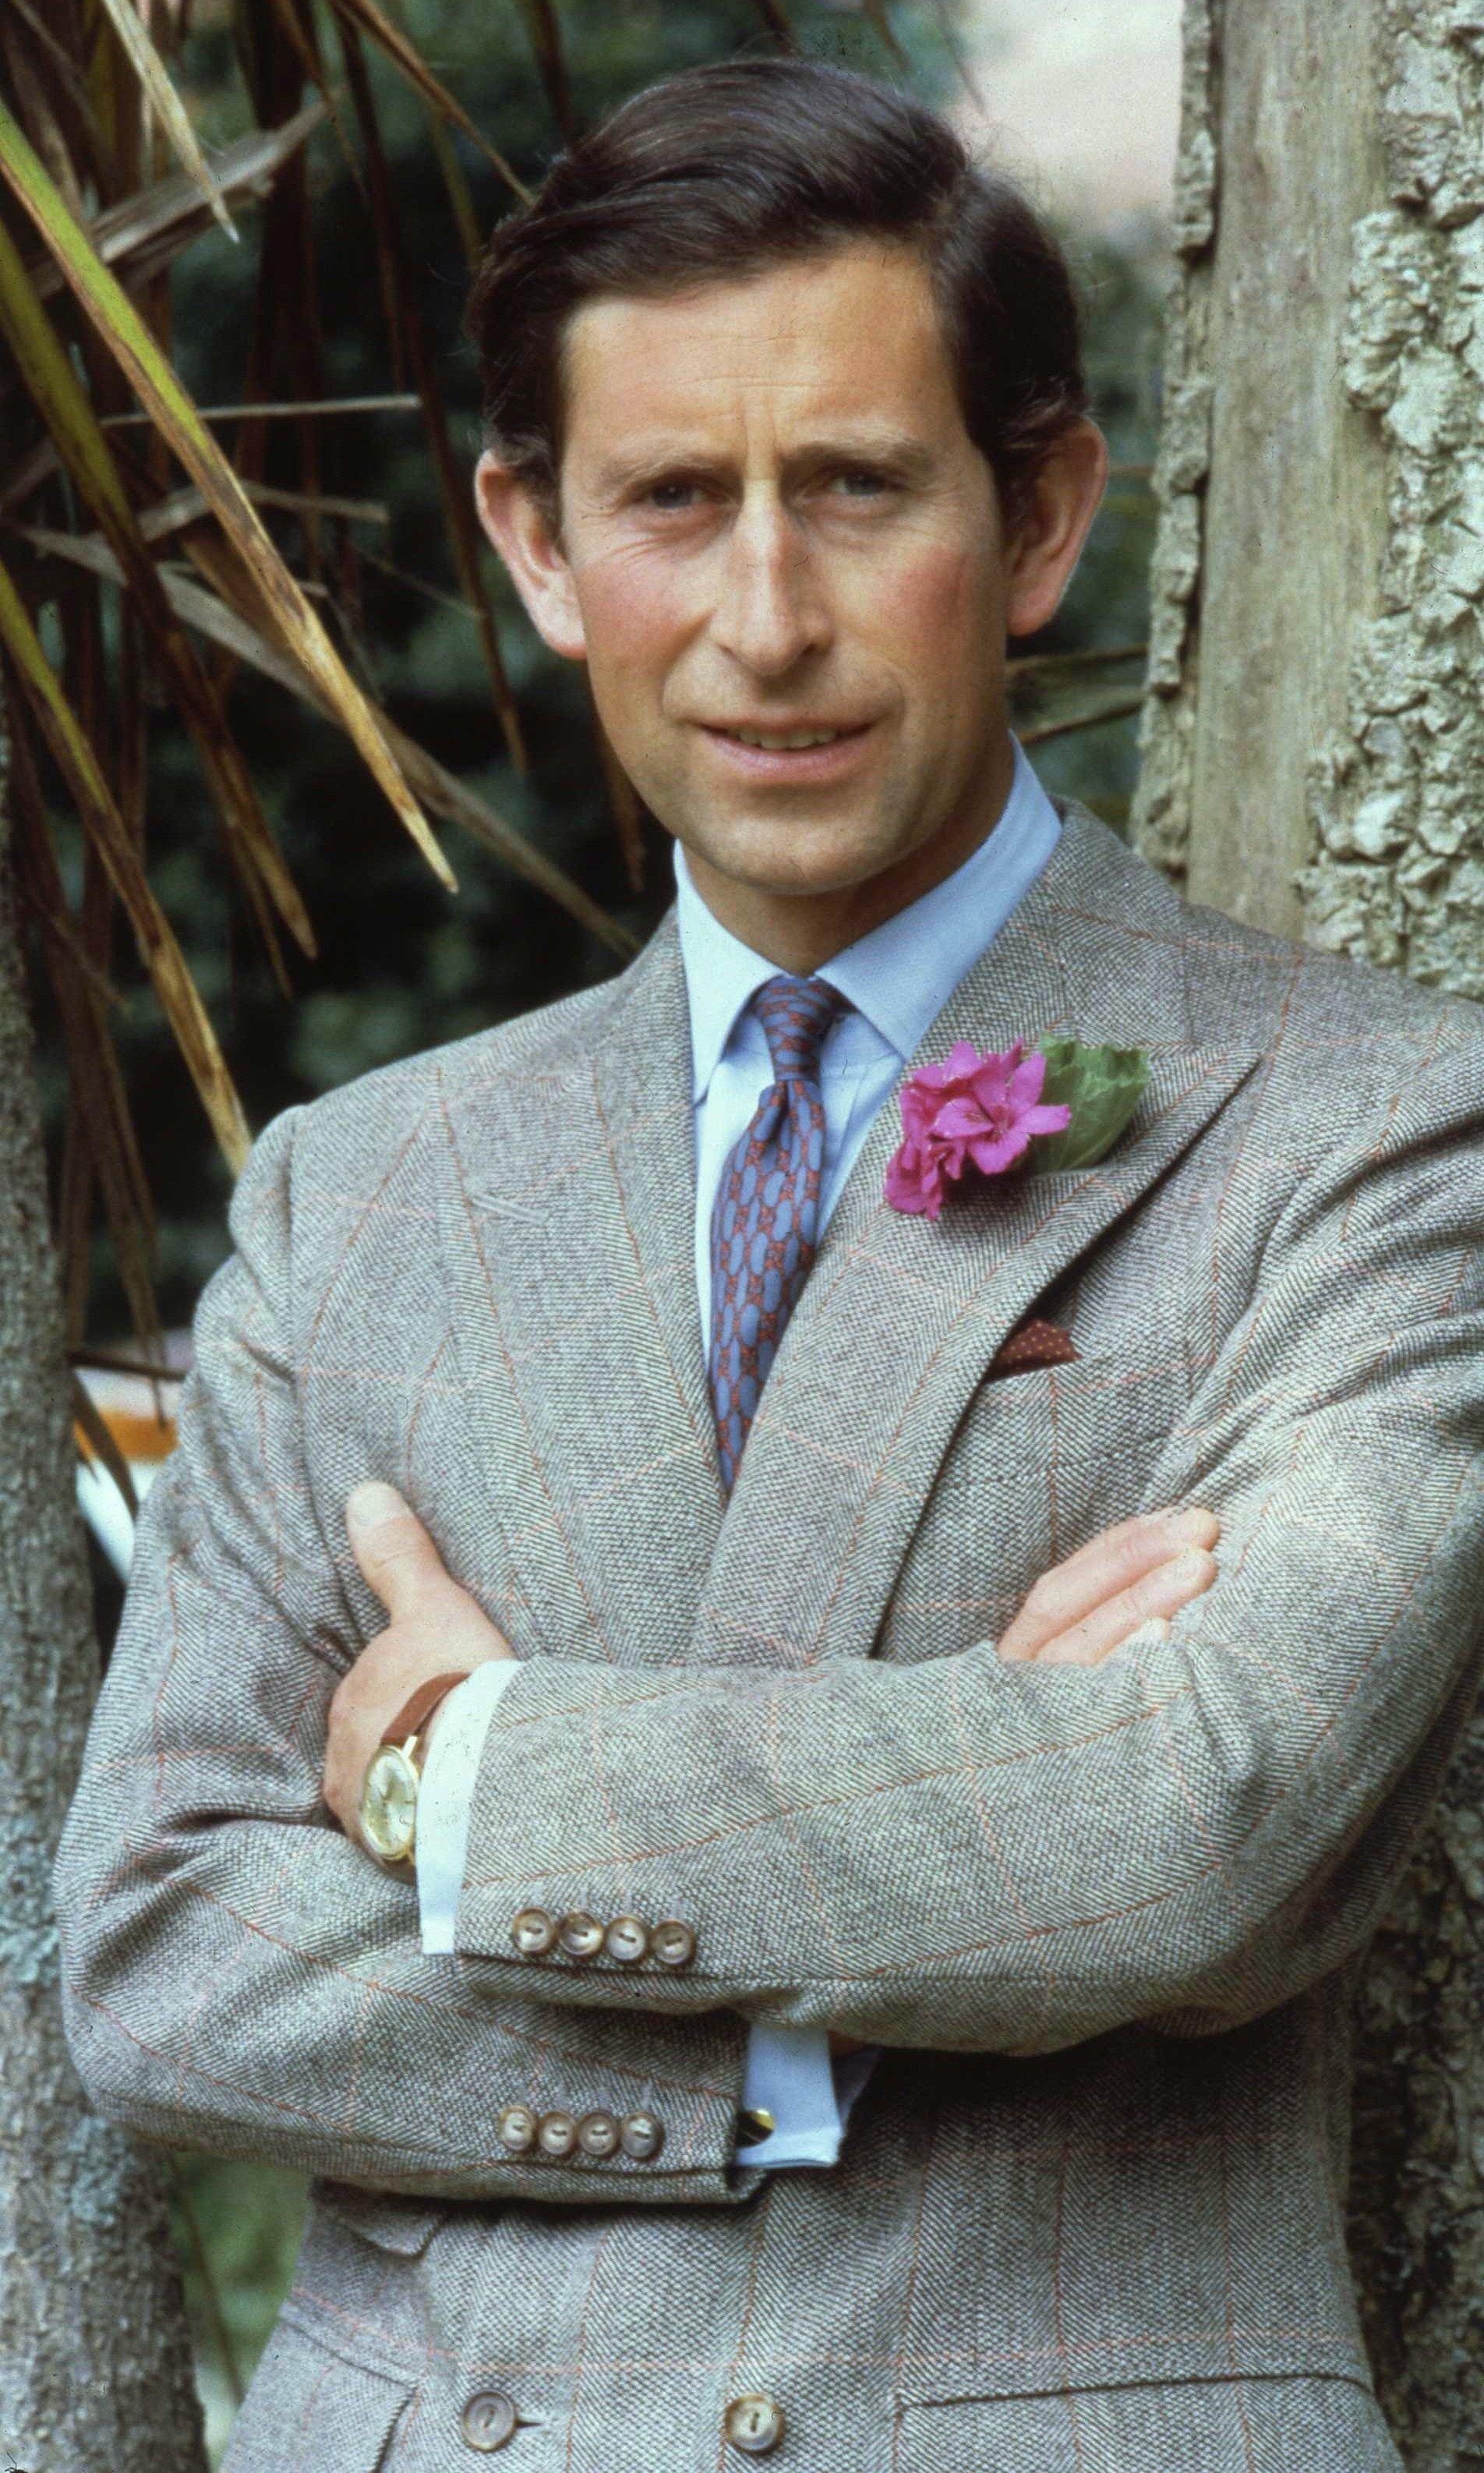 prince charles - photo #6